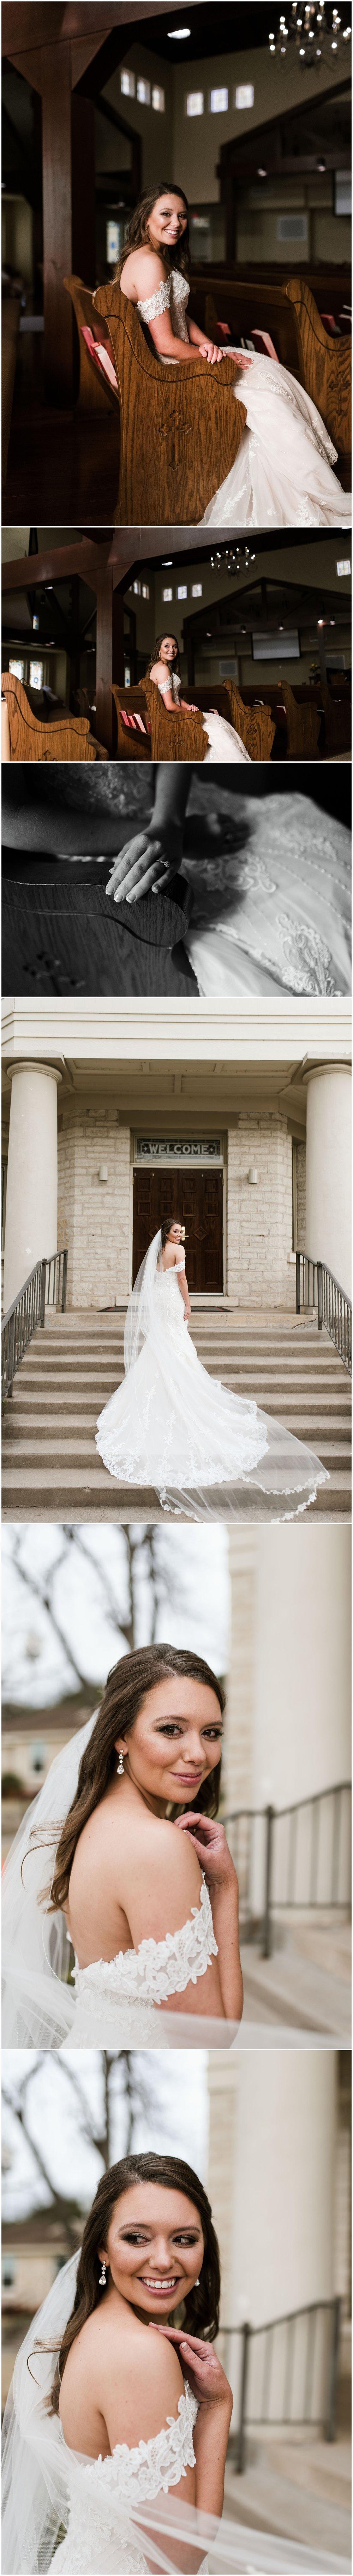 Glen Rose Bridal Session | Fort Worth Wedding Photographer | www.jordanmitchellphotography.com